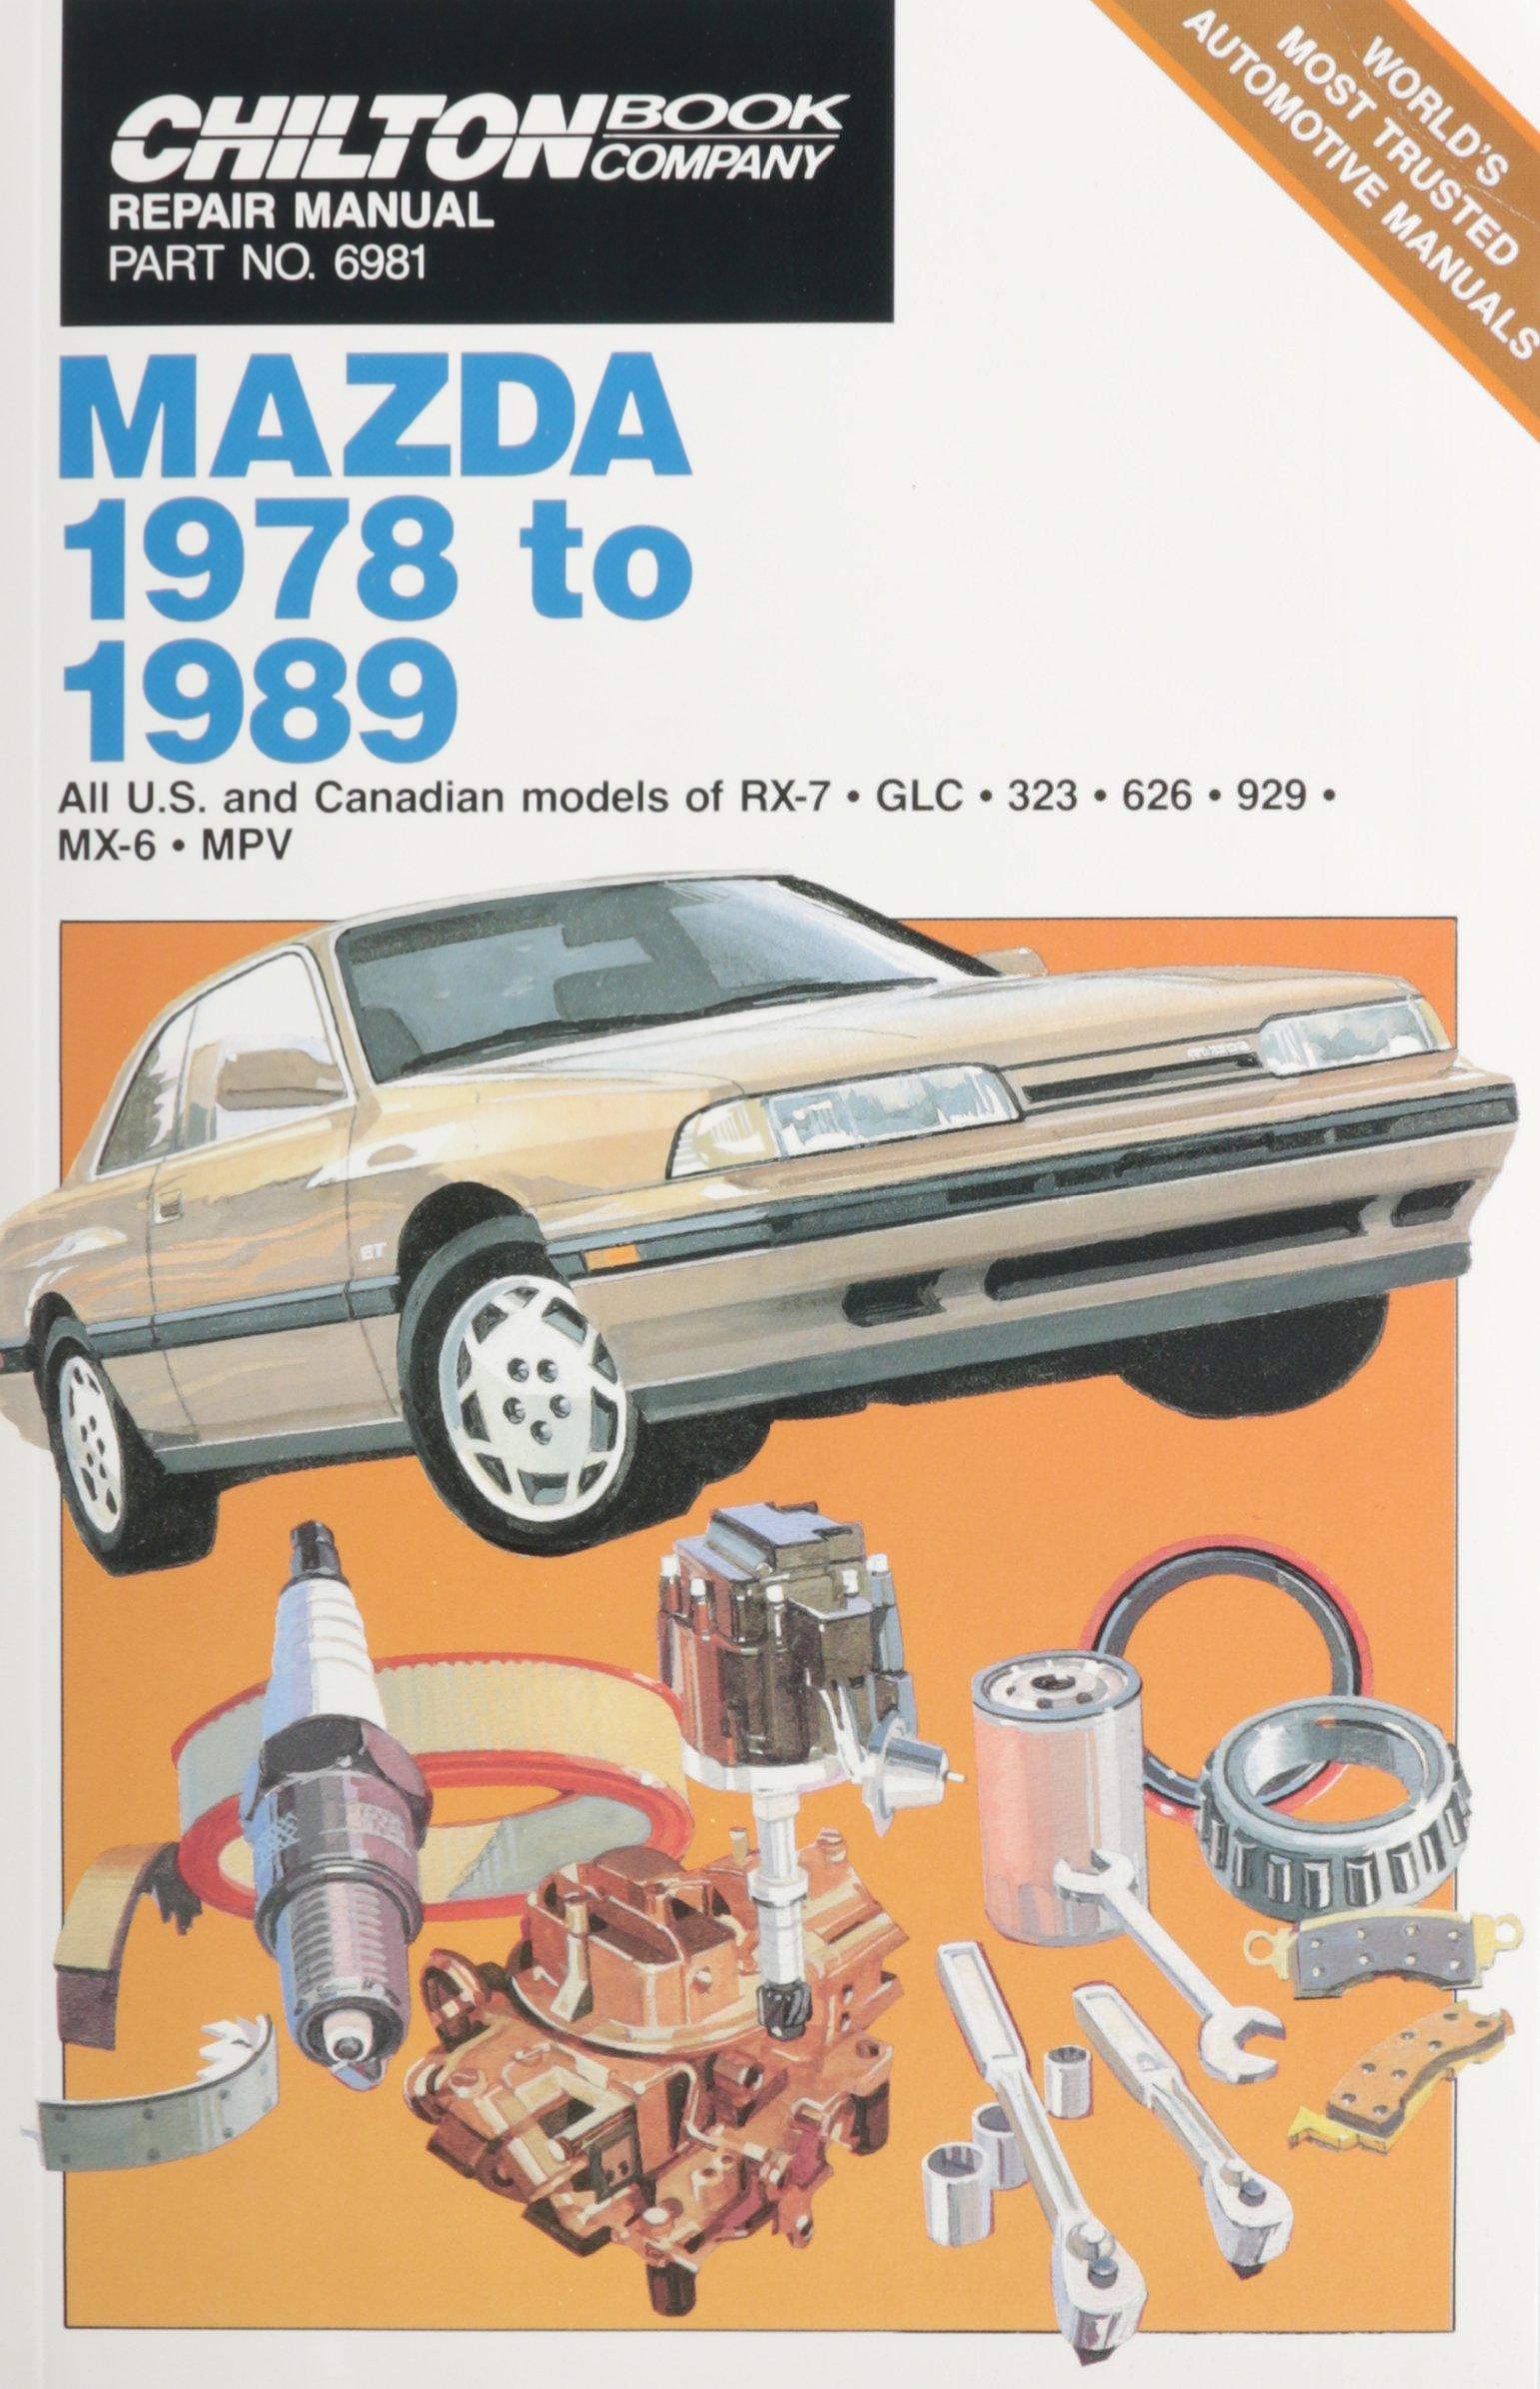 Chilton Book Company Repair Manual: Mazda, 1978 to 1989--All U.S. and  Canadian Models of RX-7, GLC, 323, 626, 929, MX-6, MPV (Haynes Repair Manual):  ...